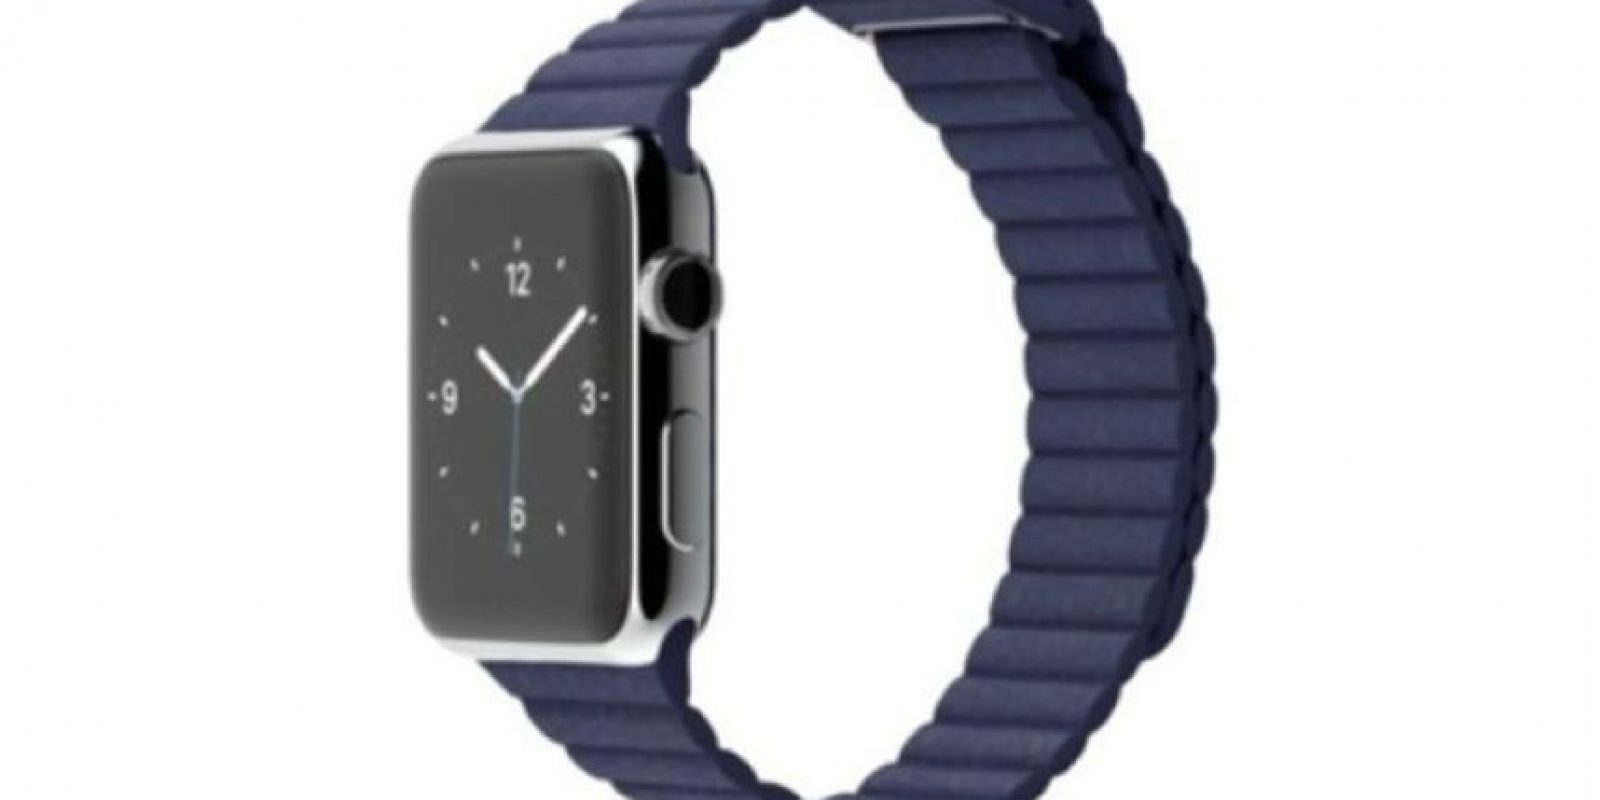 Peso: 25 gramos (modelo 38mm) y 30 gramos (modelo 42mm). Foto:Apple